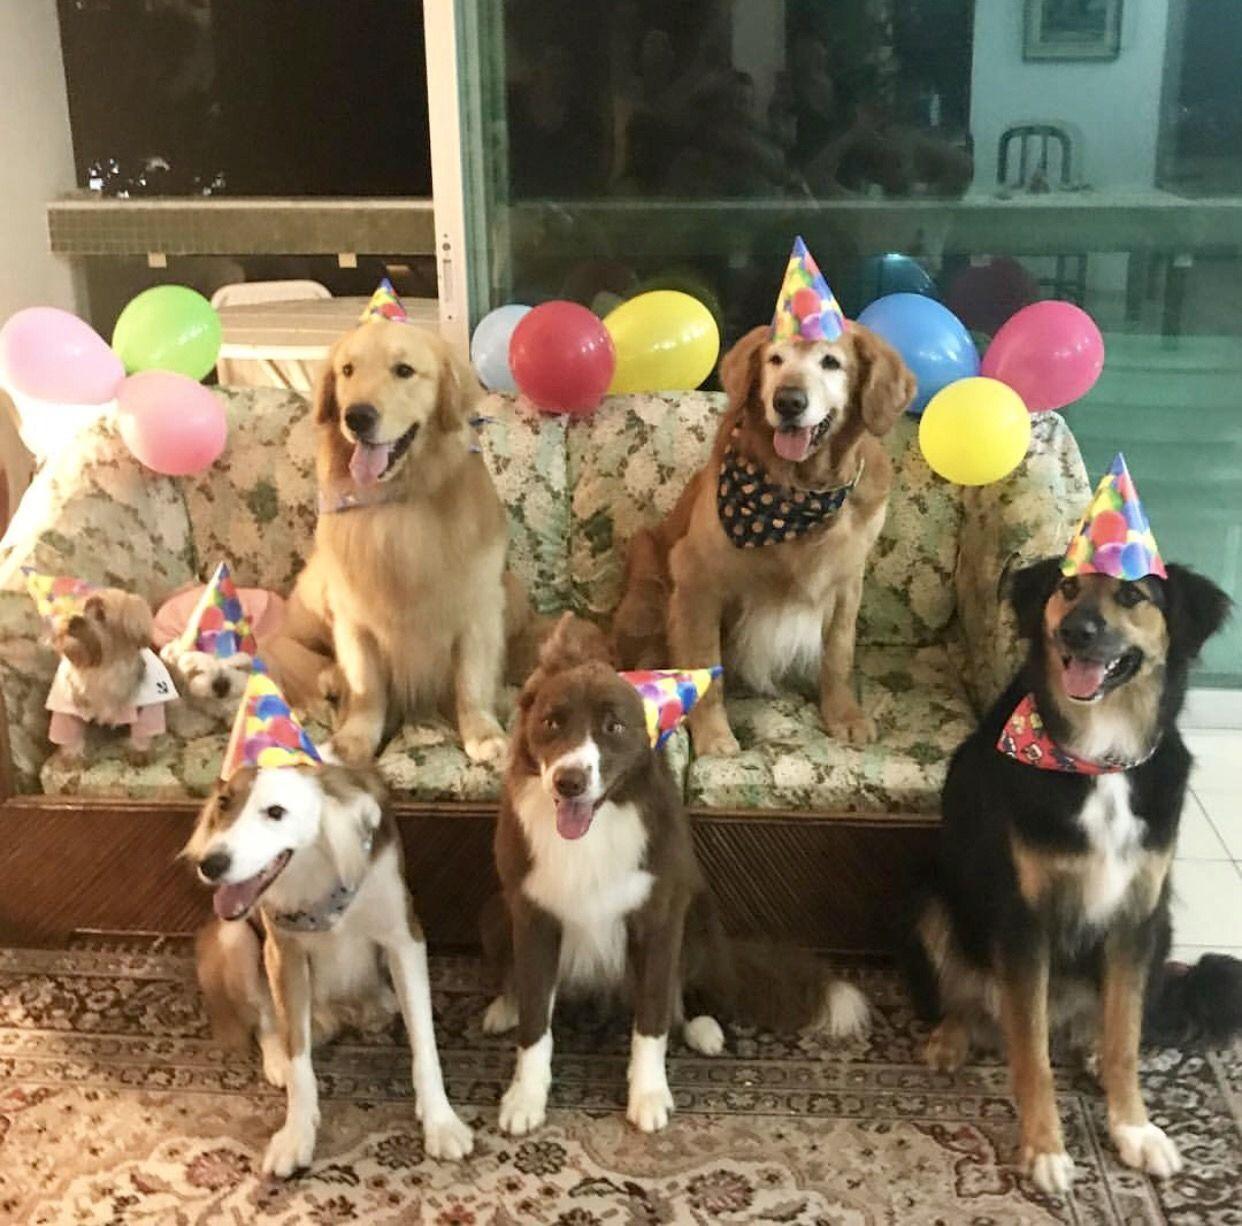 The dog on the far left